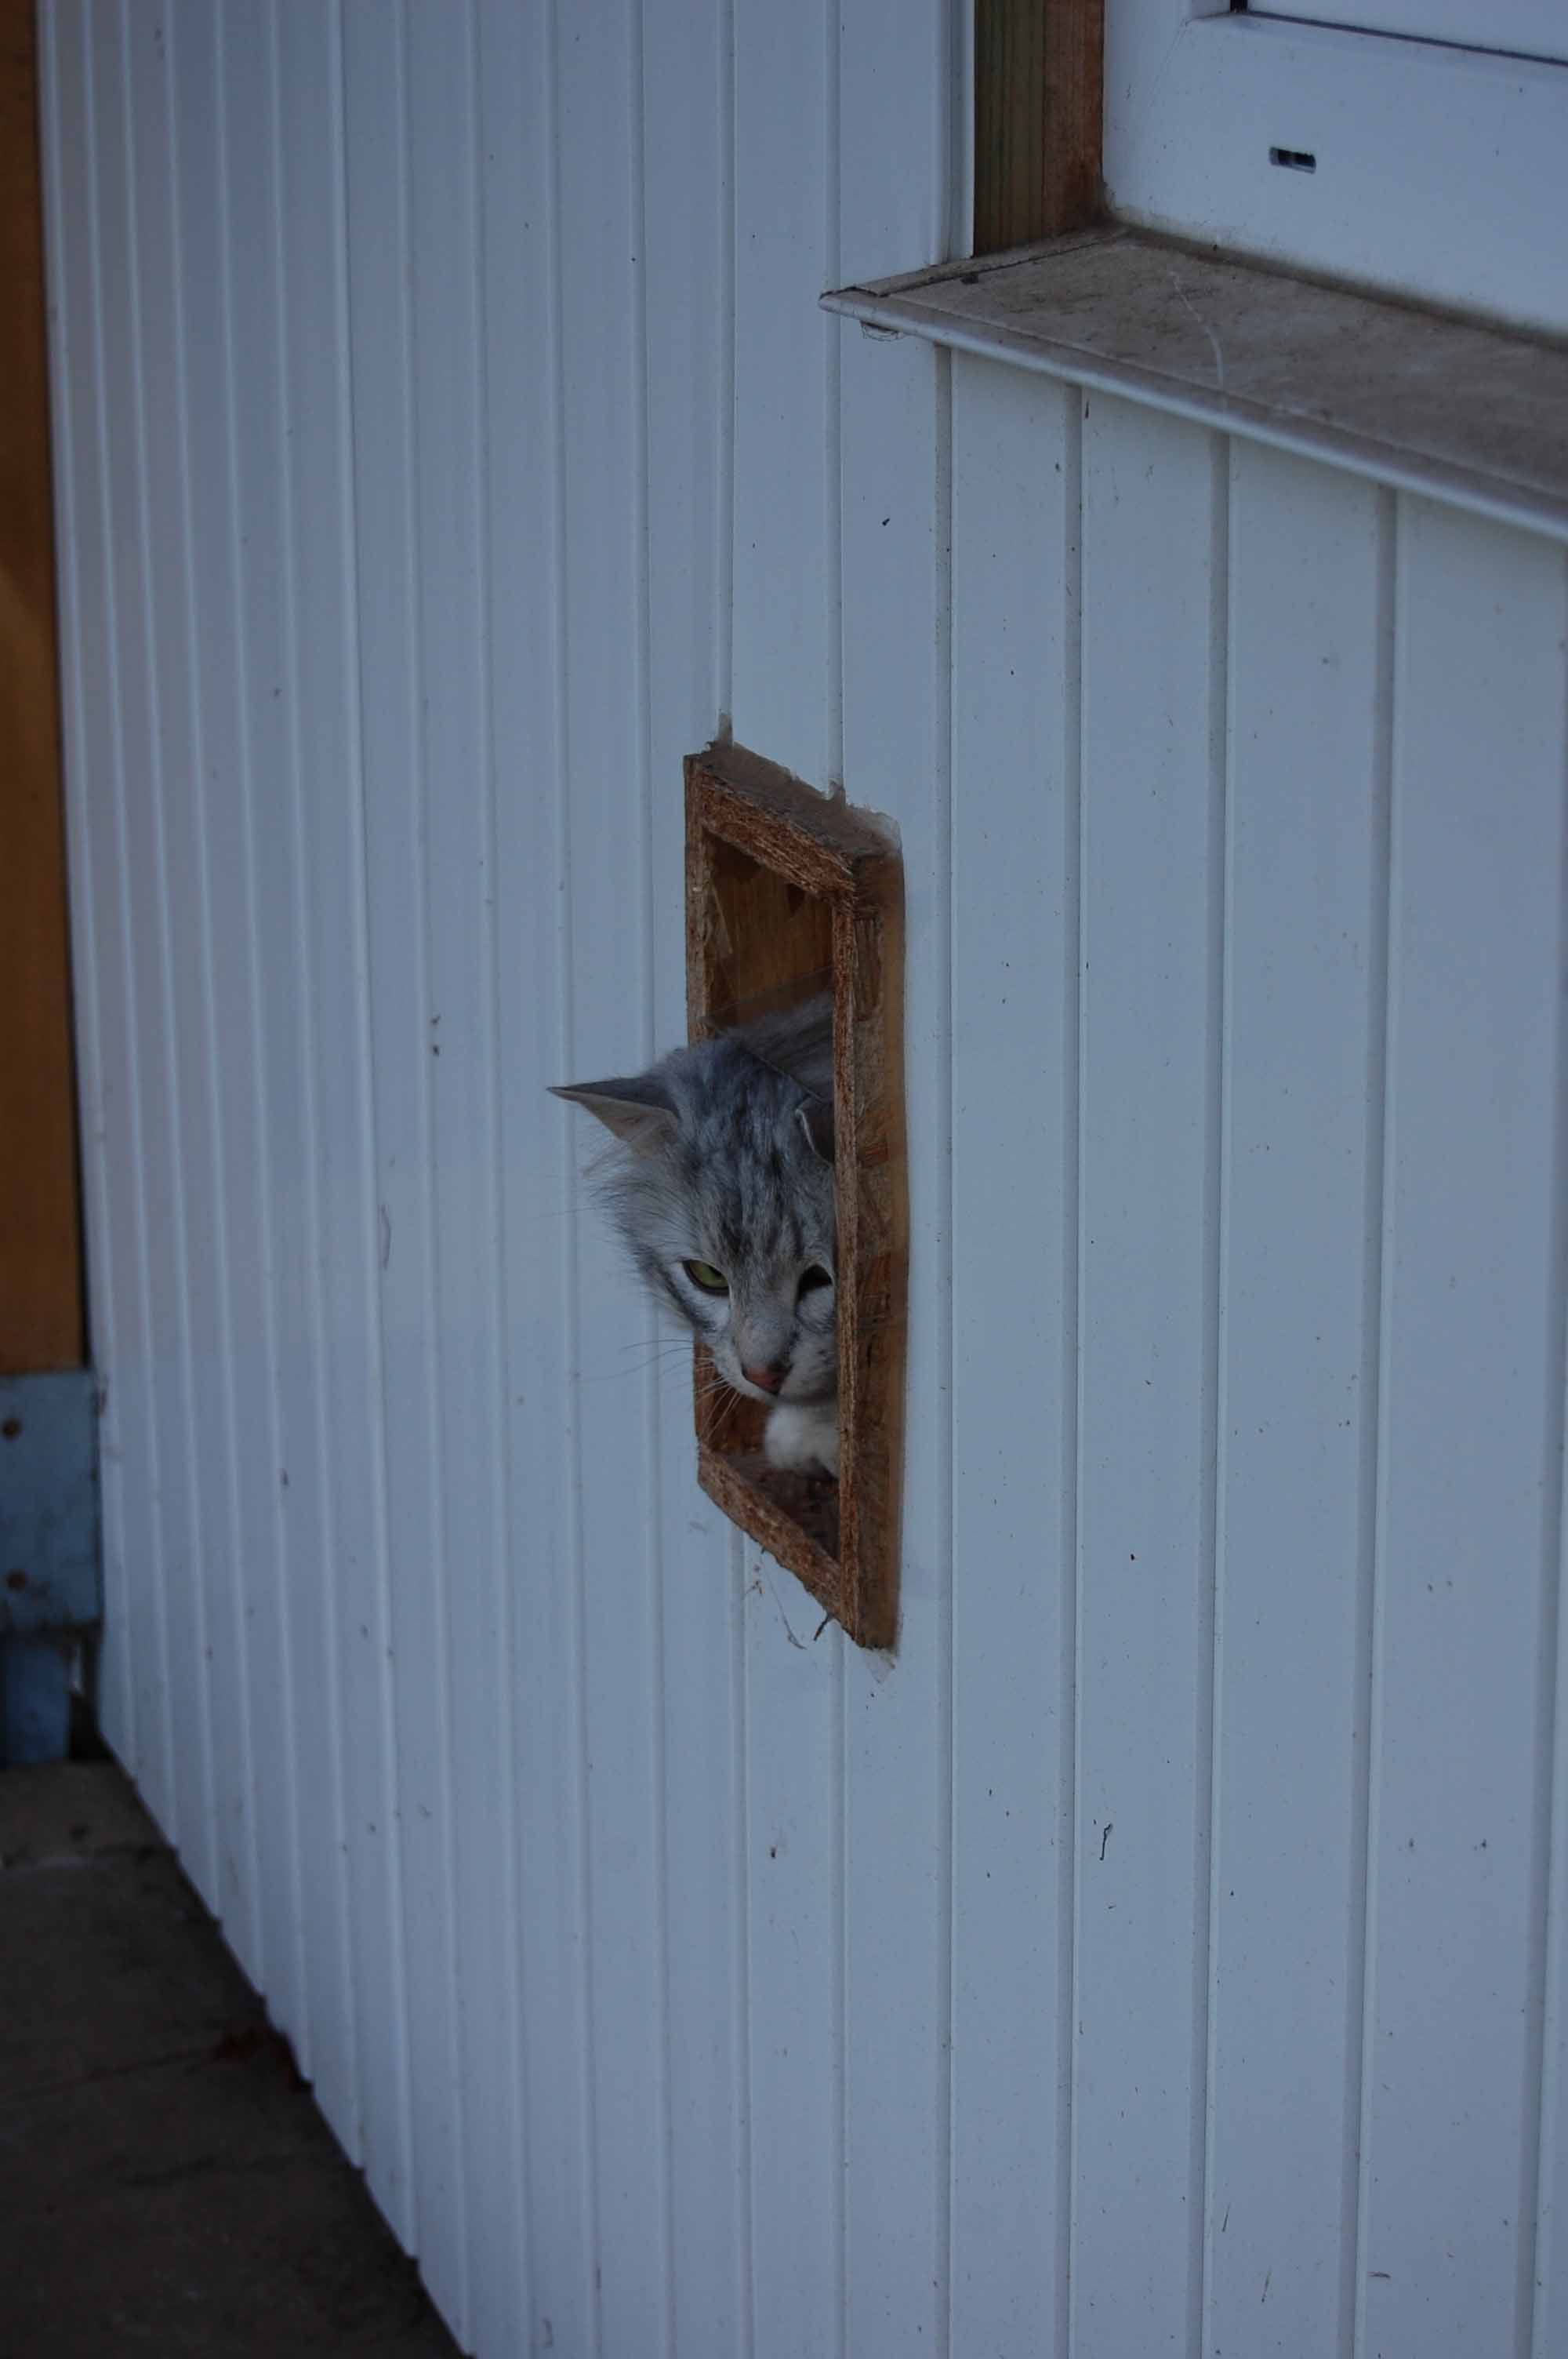 trau ich mich raus ?